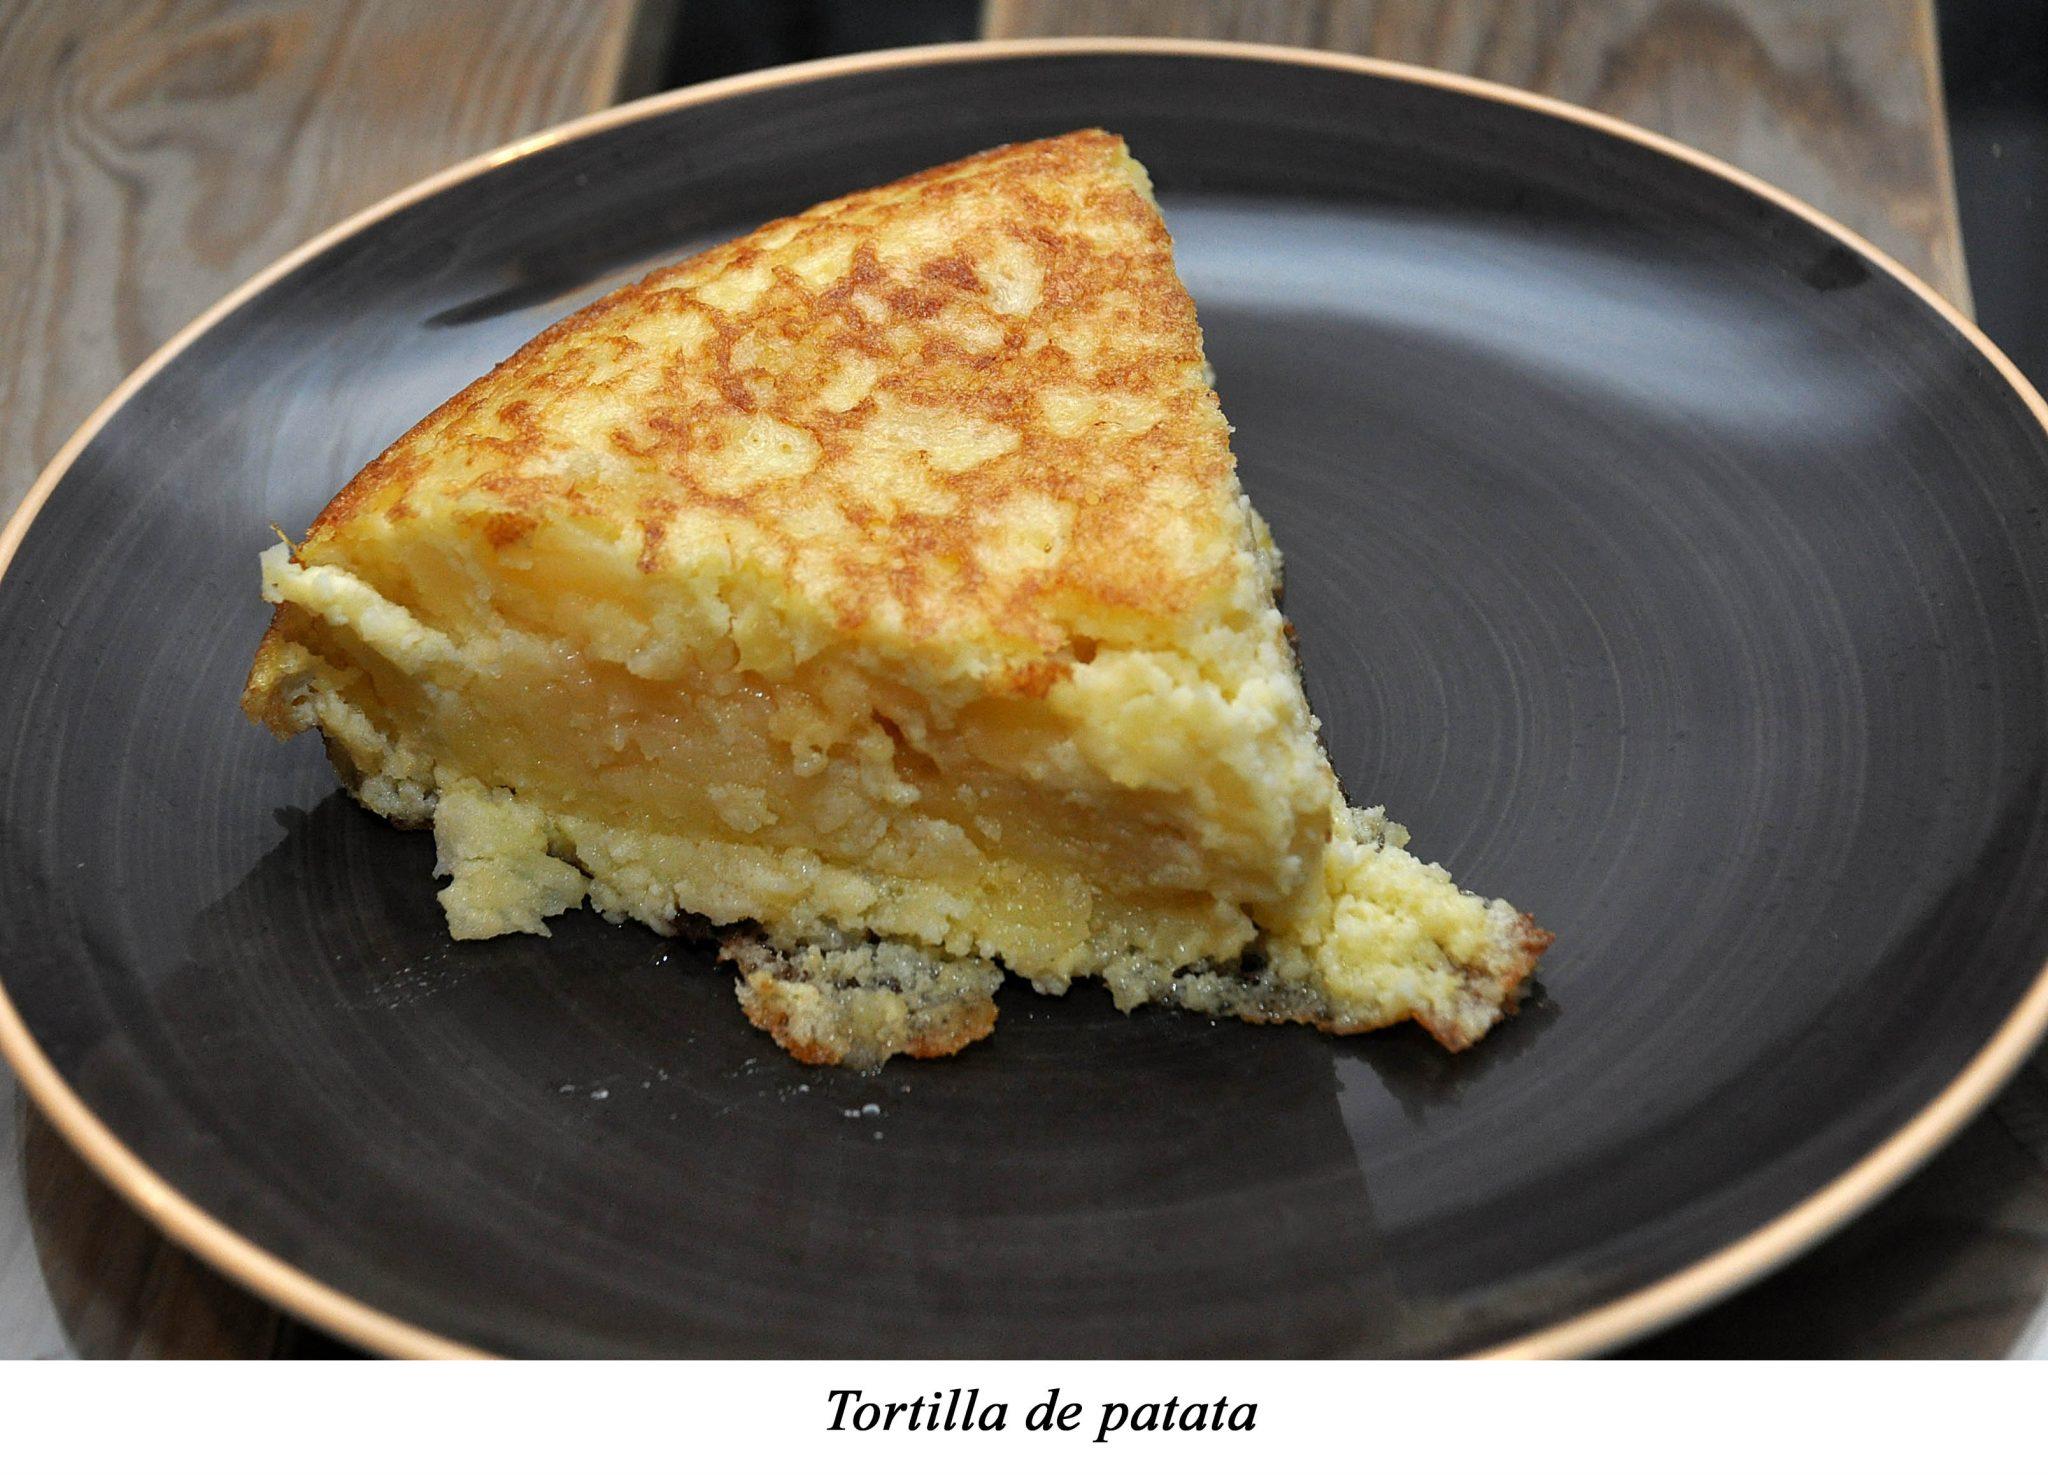 13. Tortiila de patata